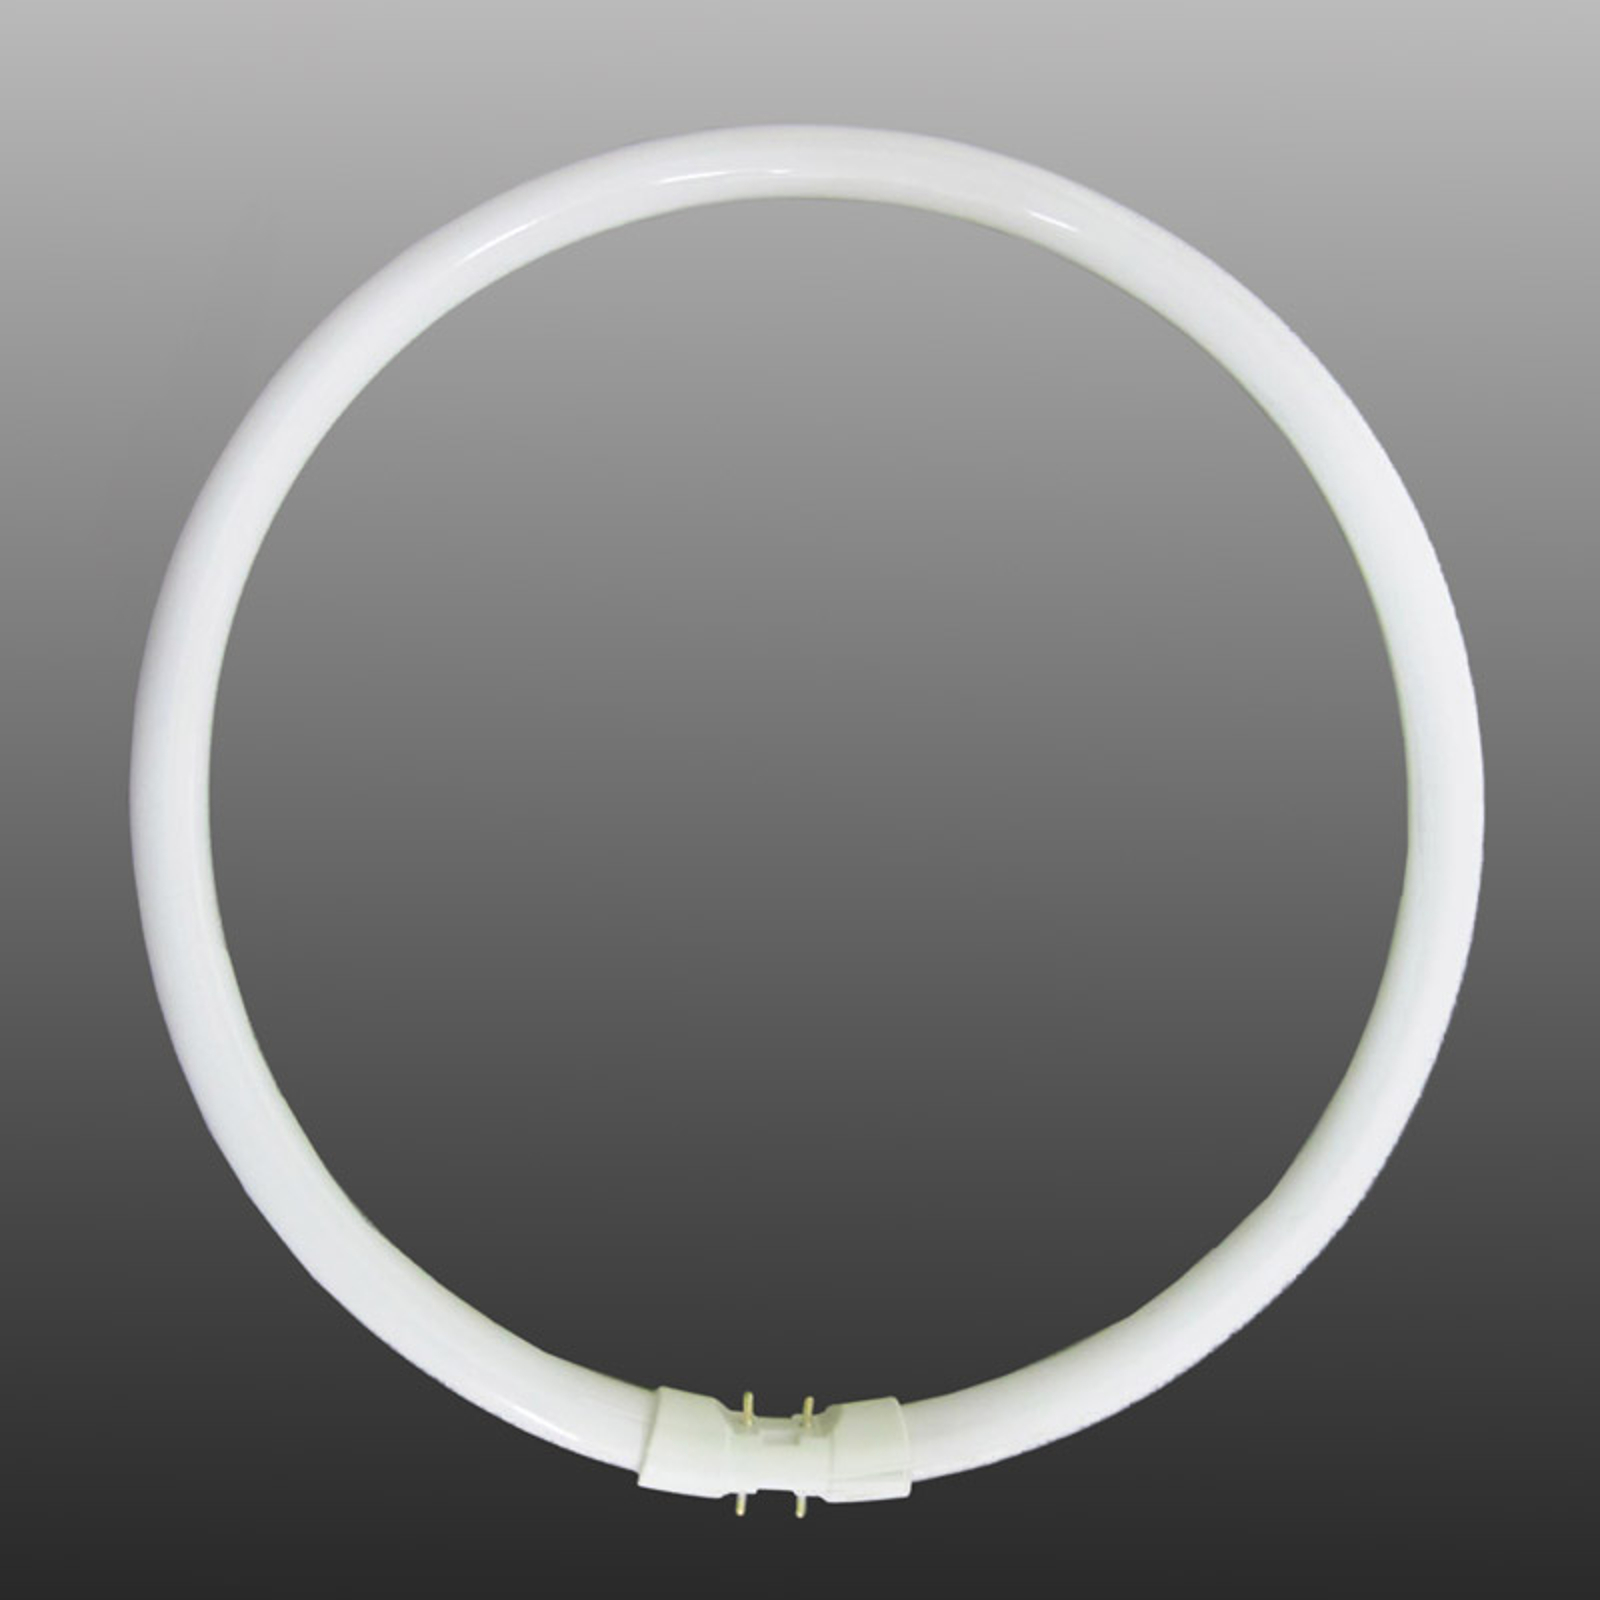 2GX13 T5 22W rengasloistelamppu, perusvalkoinen